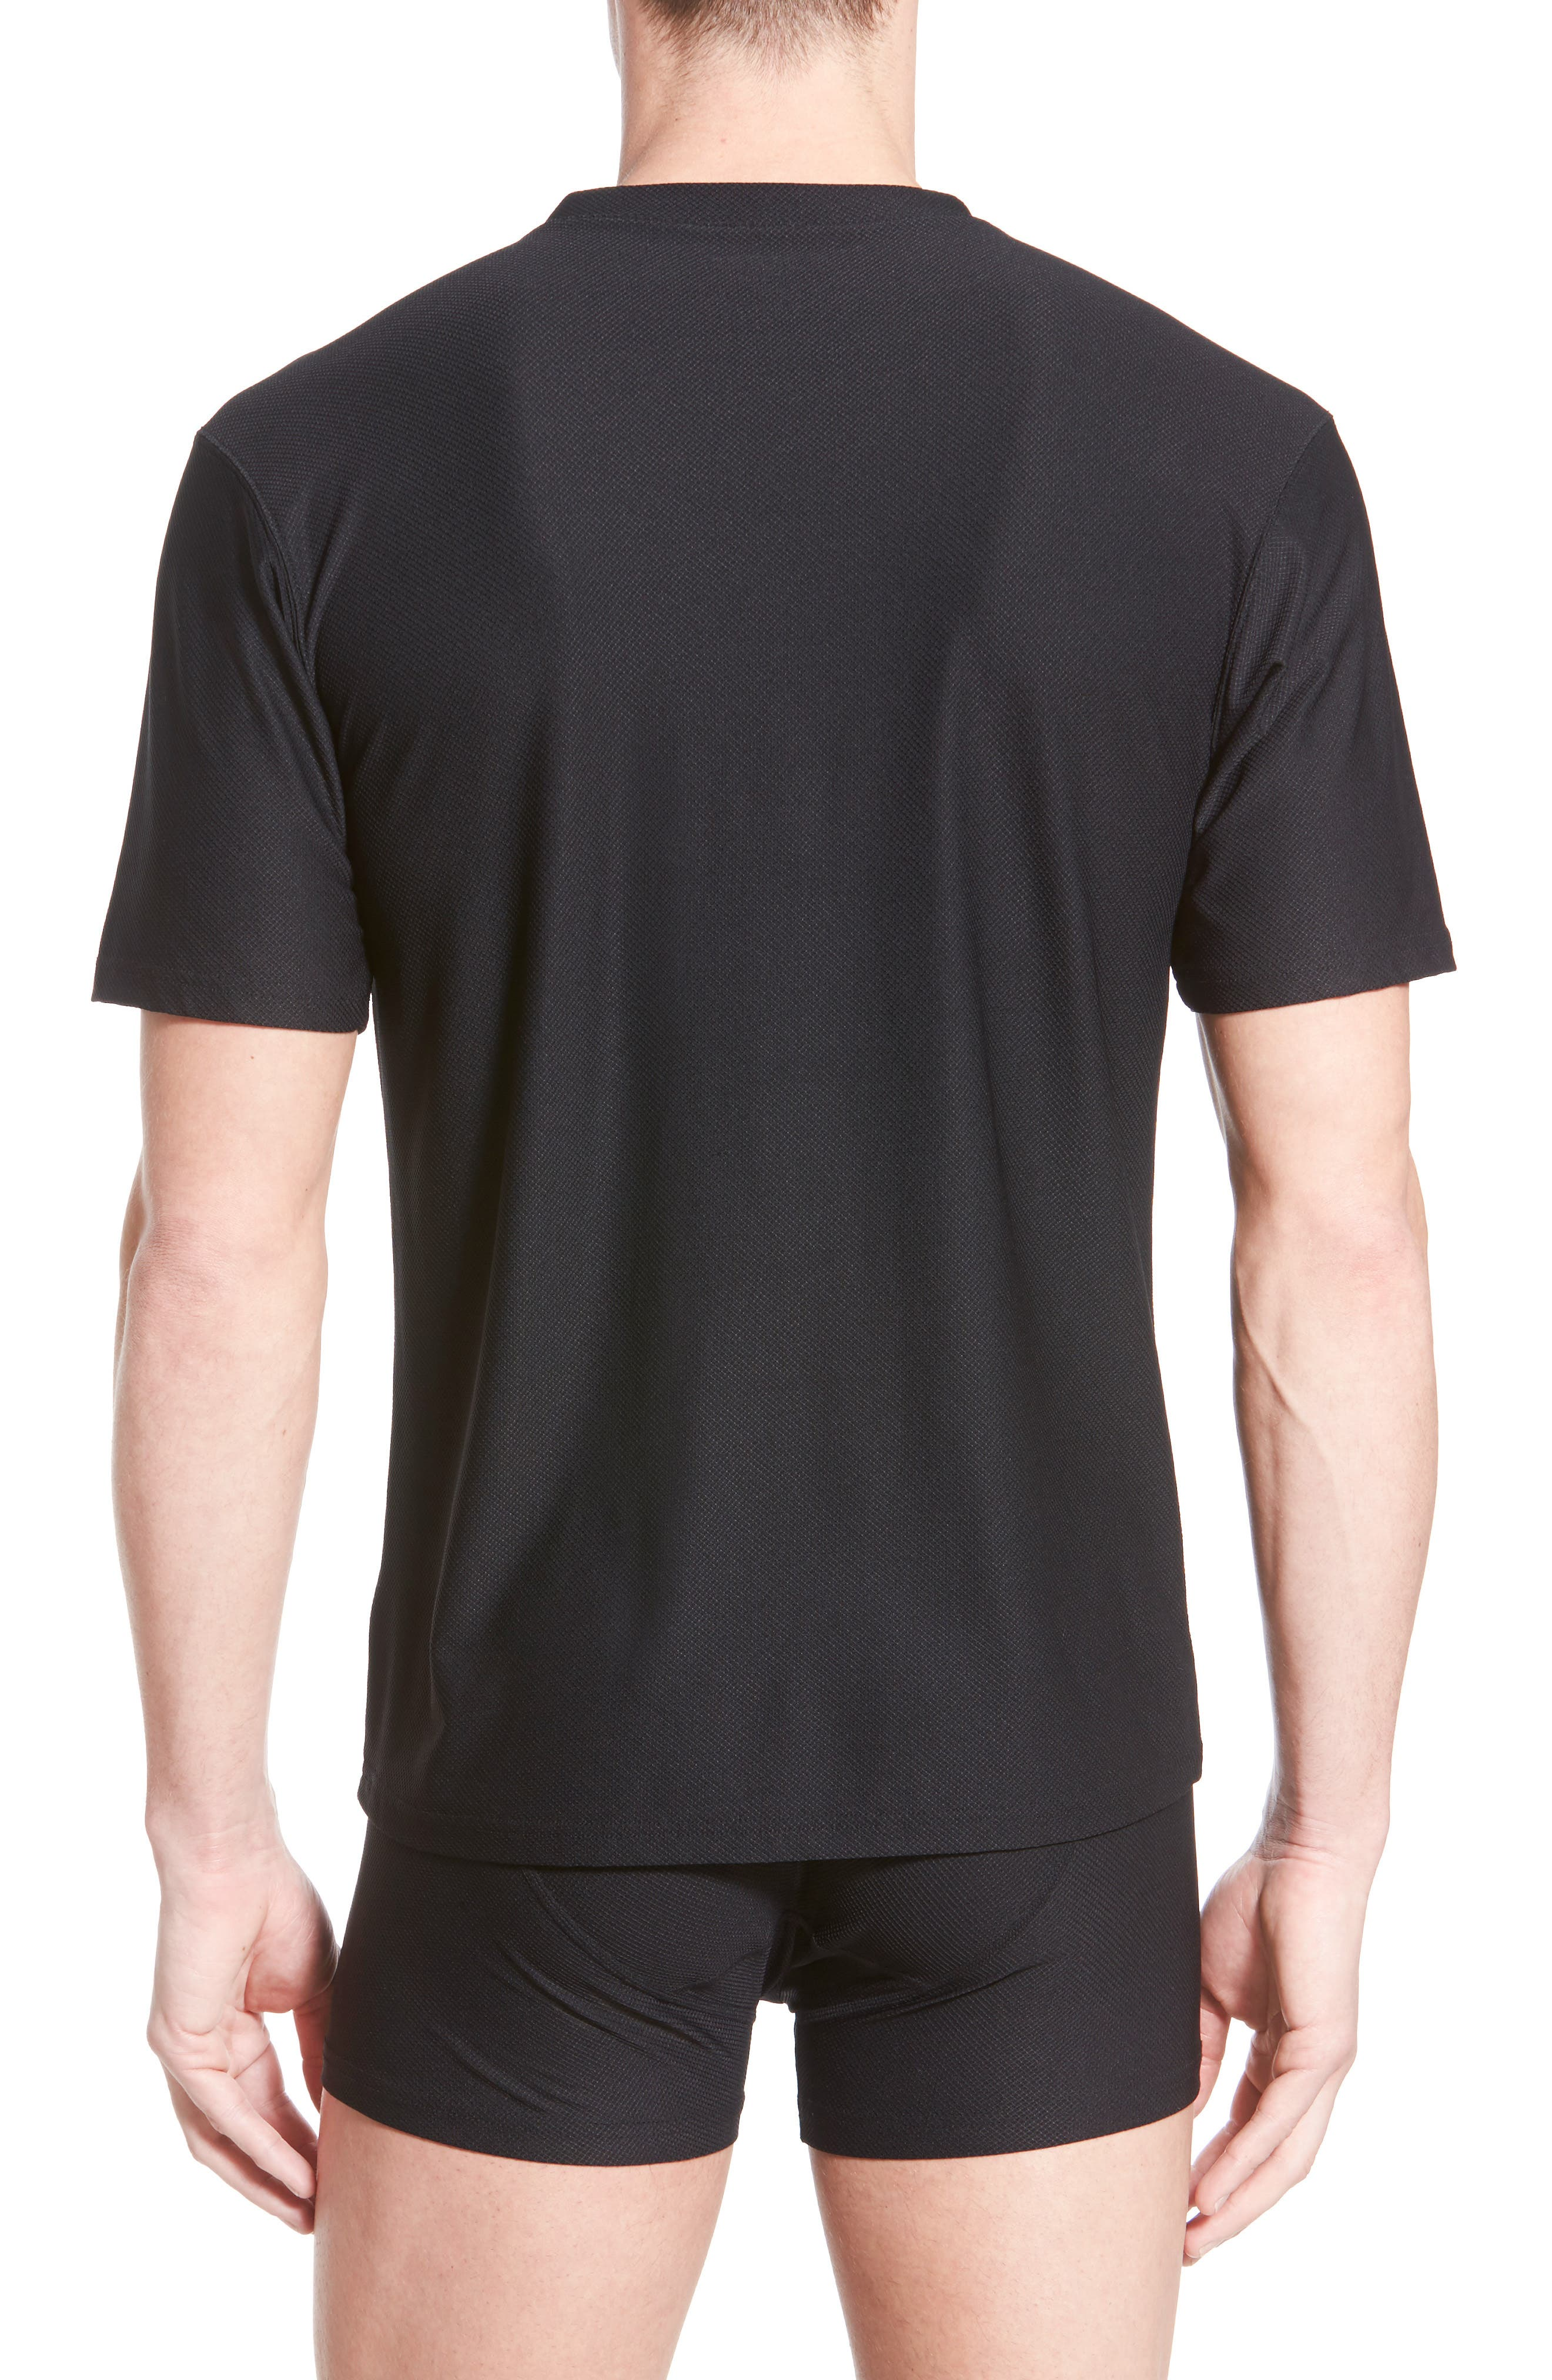 'Give-N-Go' Mesh V-Neck T-Shirt,                             Alternate thumbnail 5, color,                             BLACK